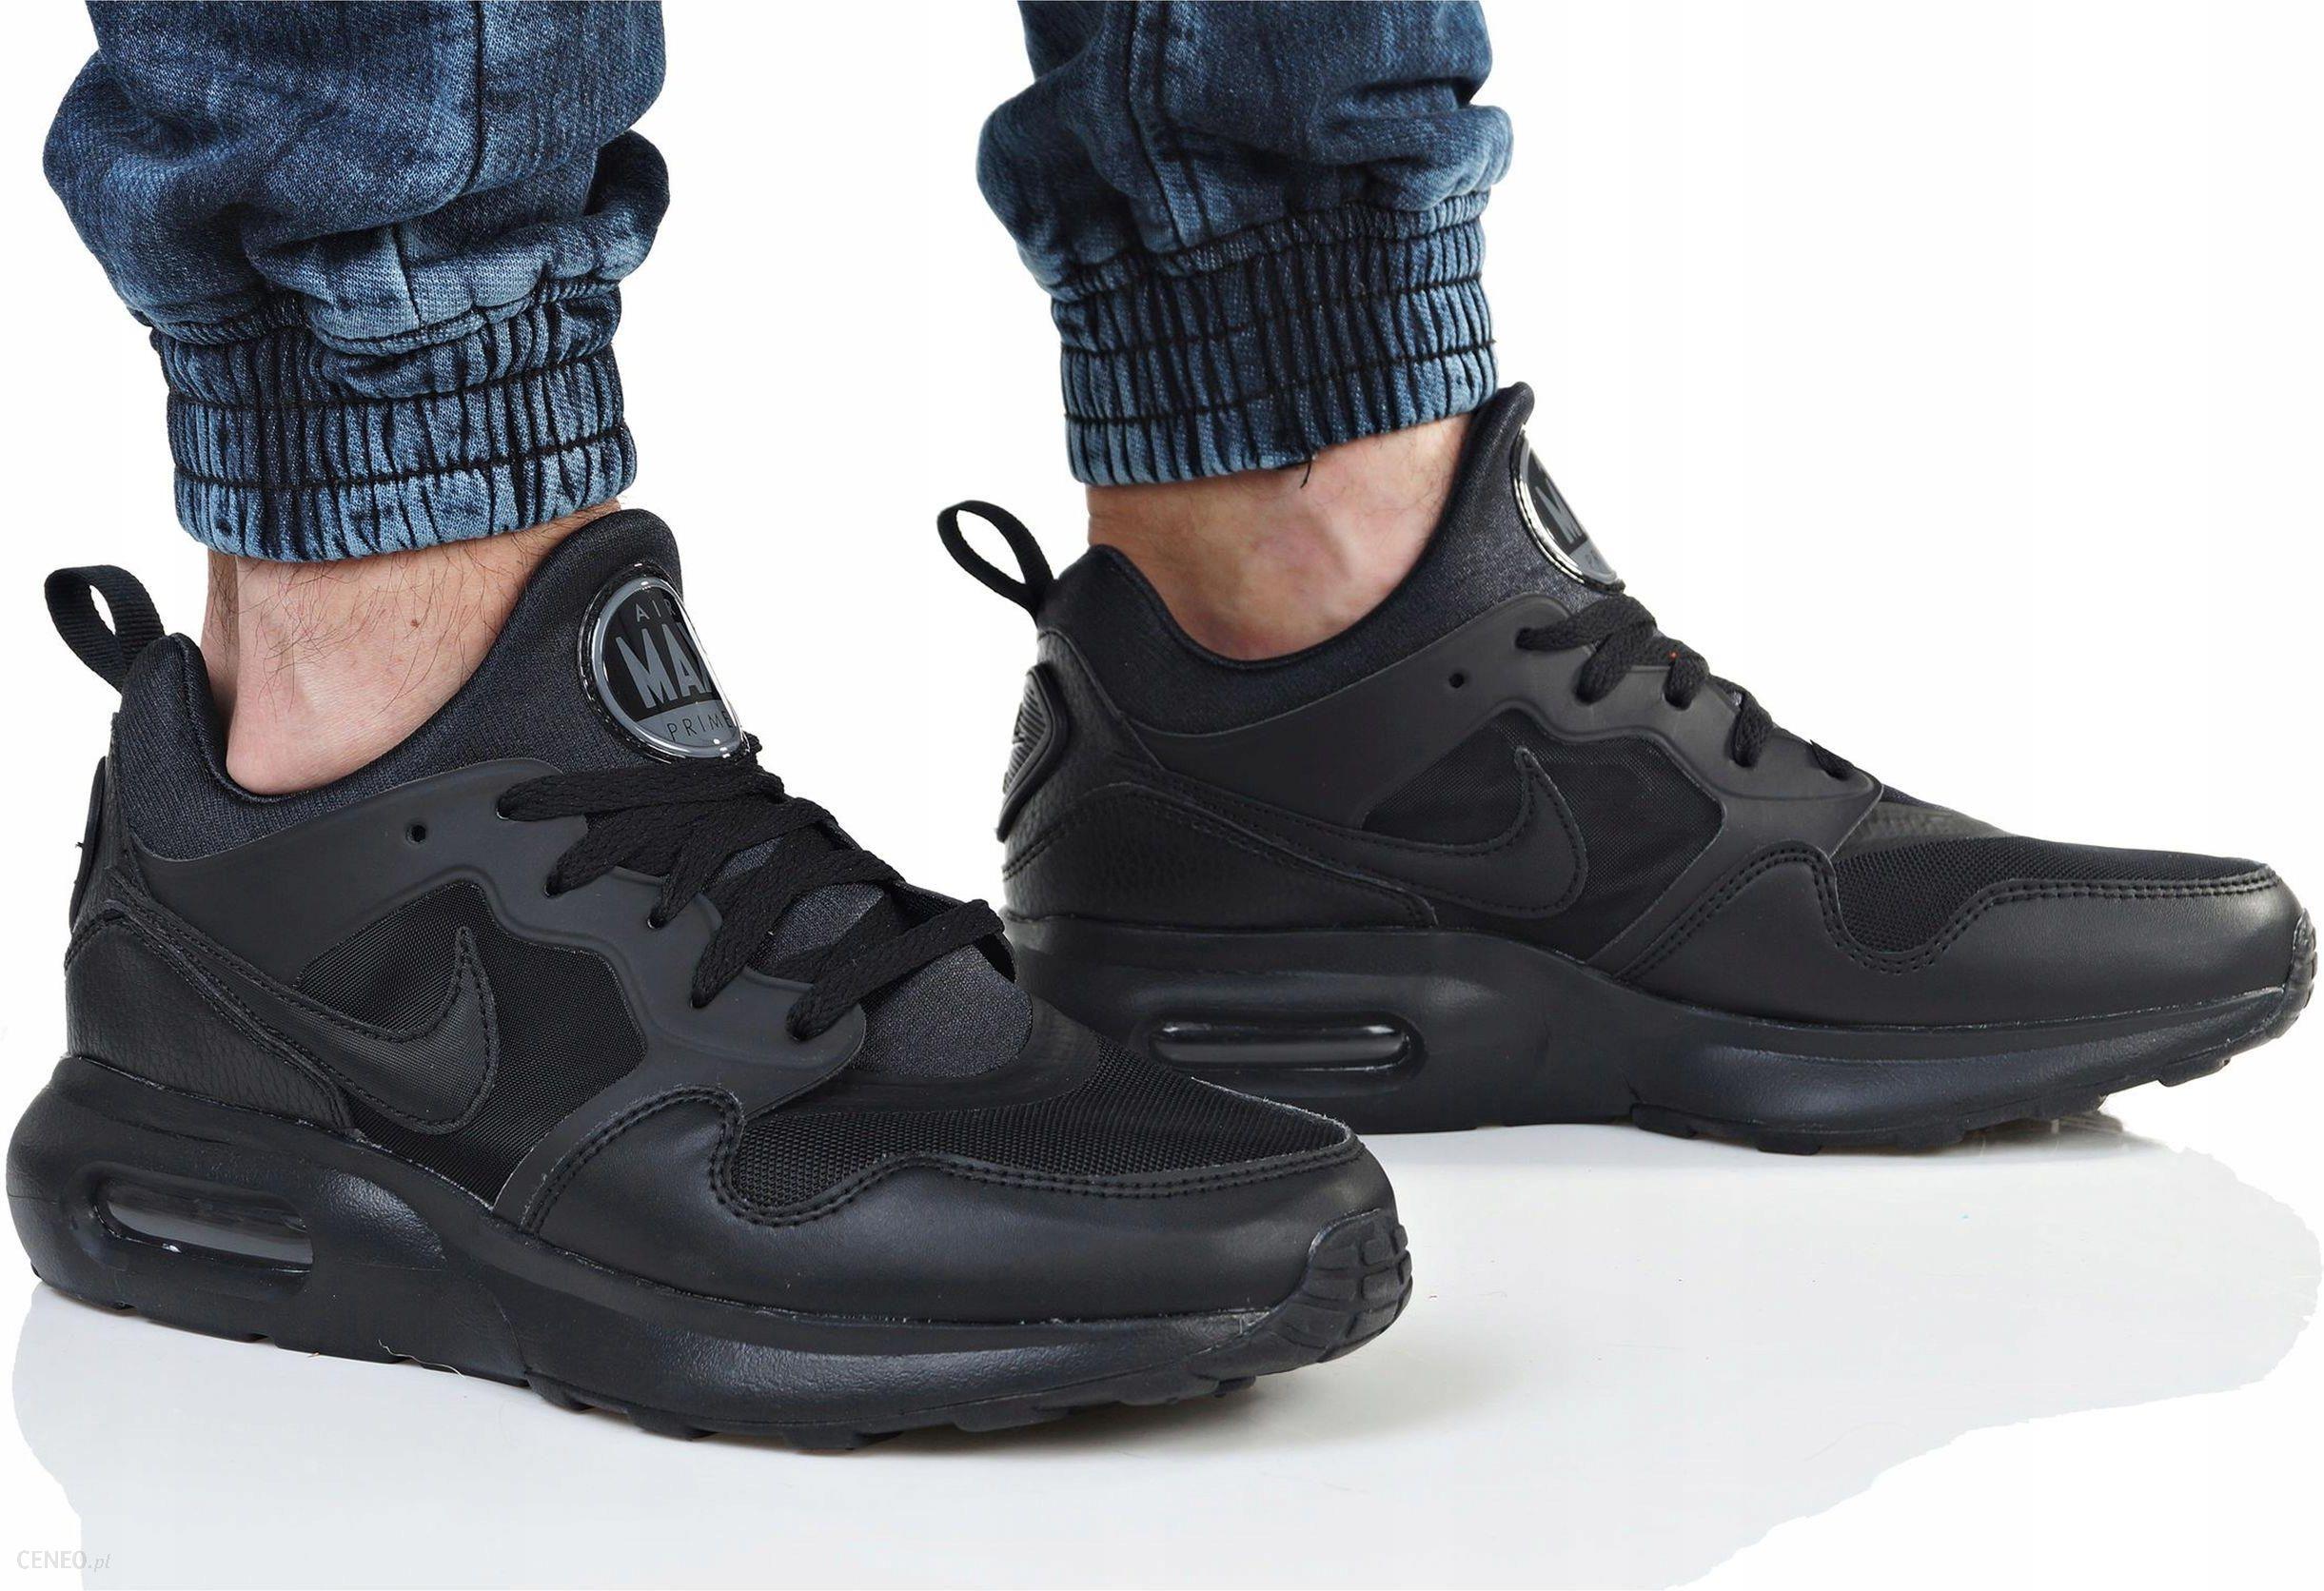 Buty Nike Air Max Prime 876068 006 Czarne R. 44 Ceny i opinie Ceneo.pl